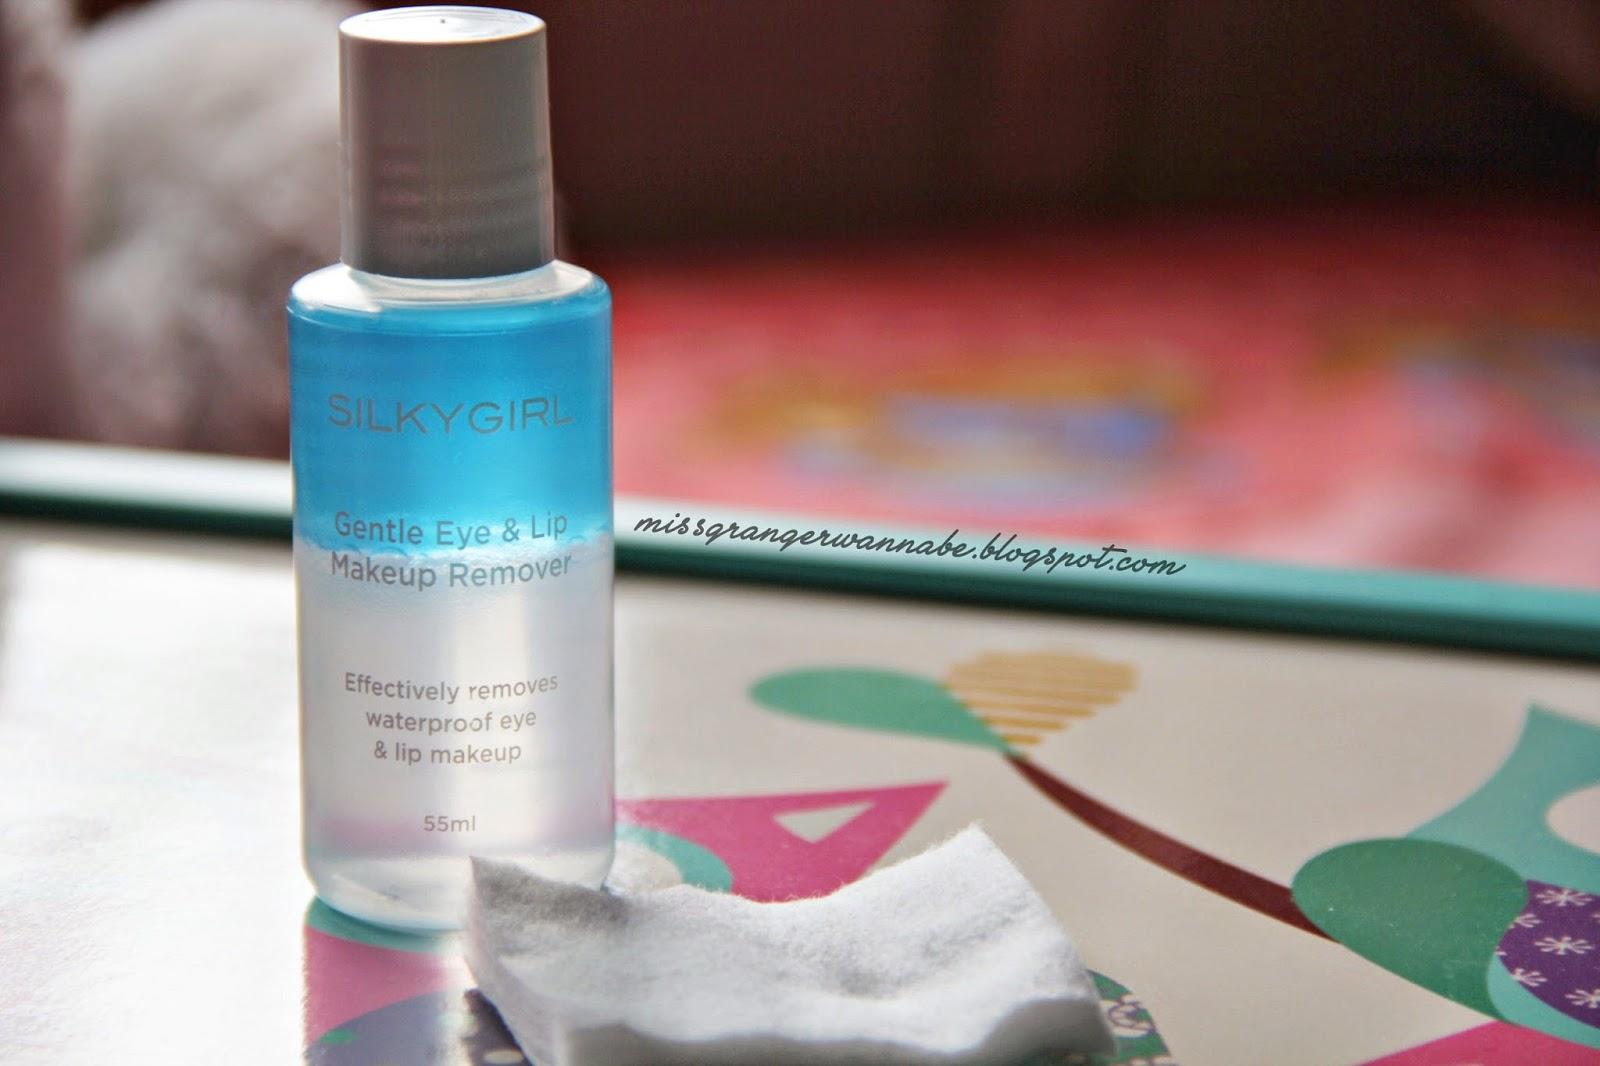 REVIEW Silkygirl Gentle Eye & Lip Makeup Remover - ekagustina